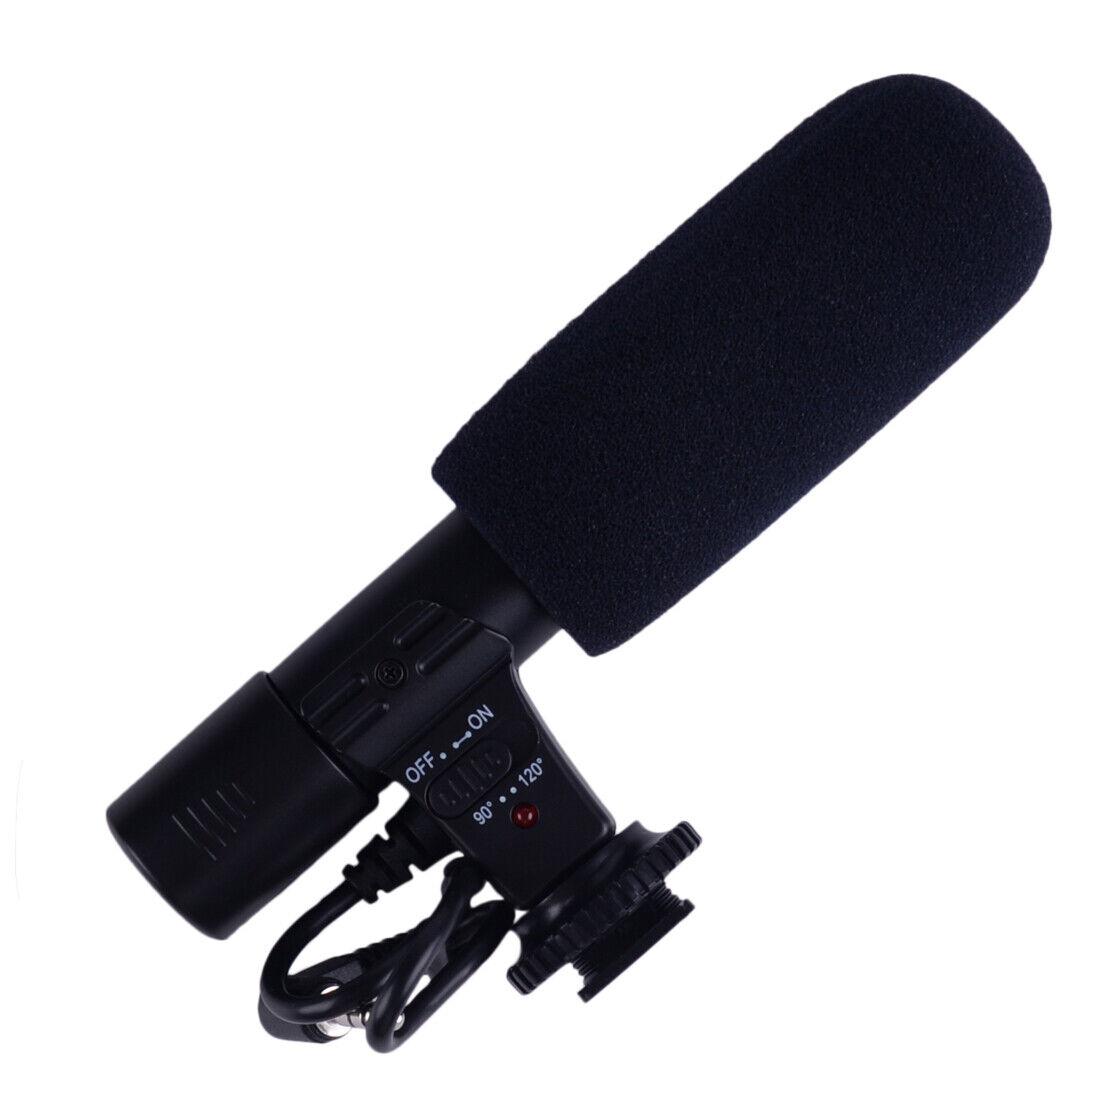 Black 3.5mm Stereo Microphone Fit For Canon Nikon DSLR Camera DV Camcorder li